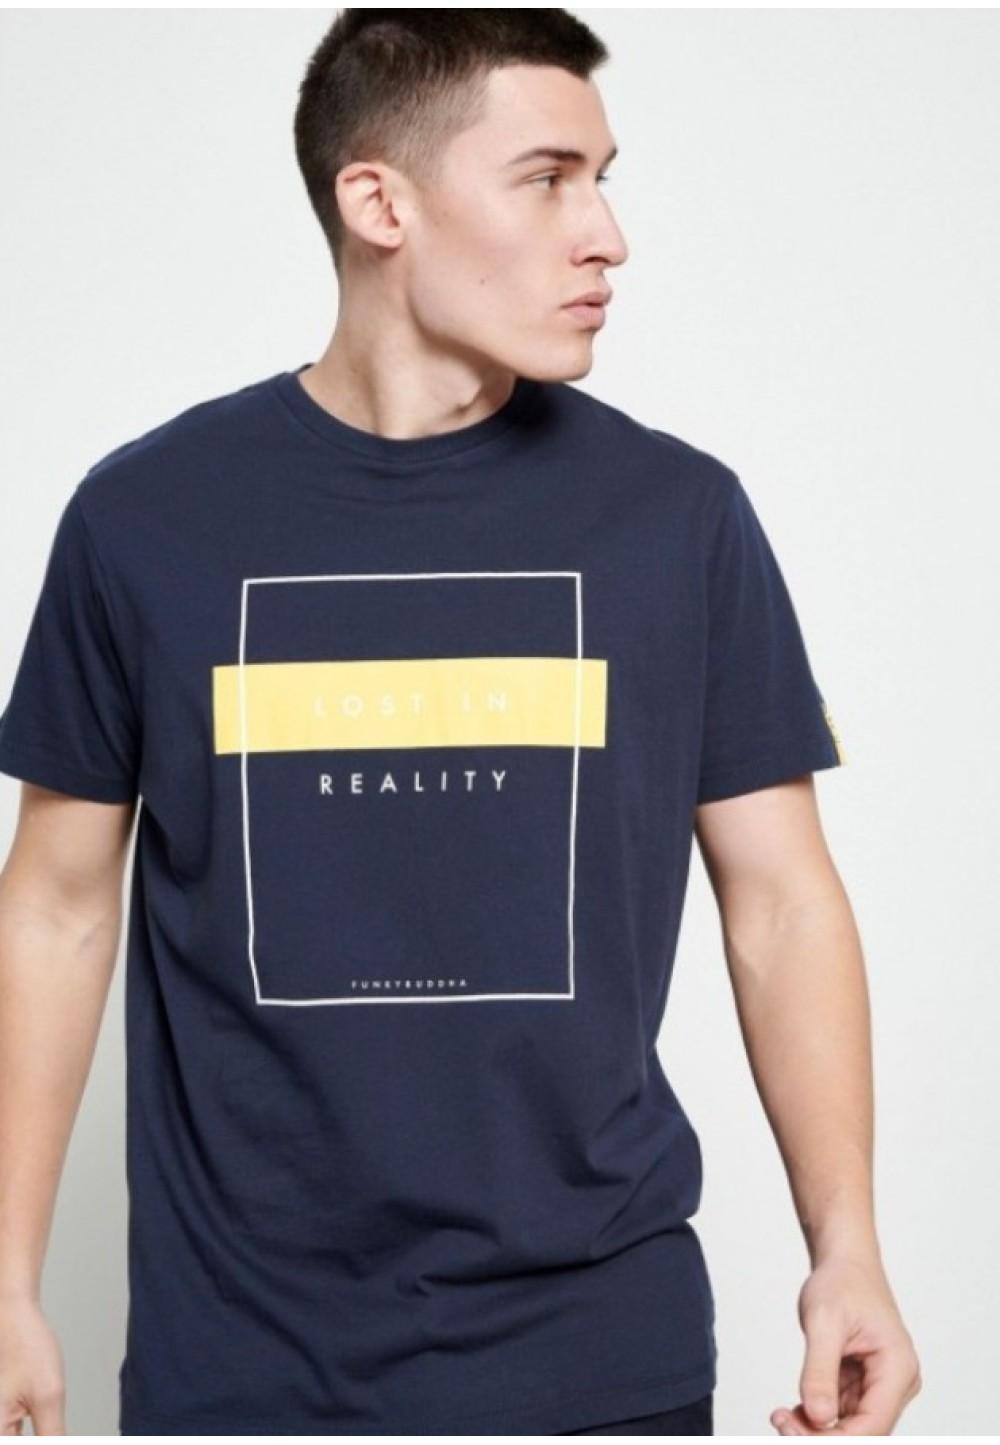 Стильна футболка iз текстовим принтом